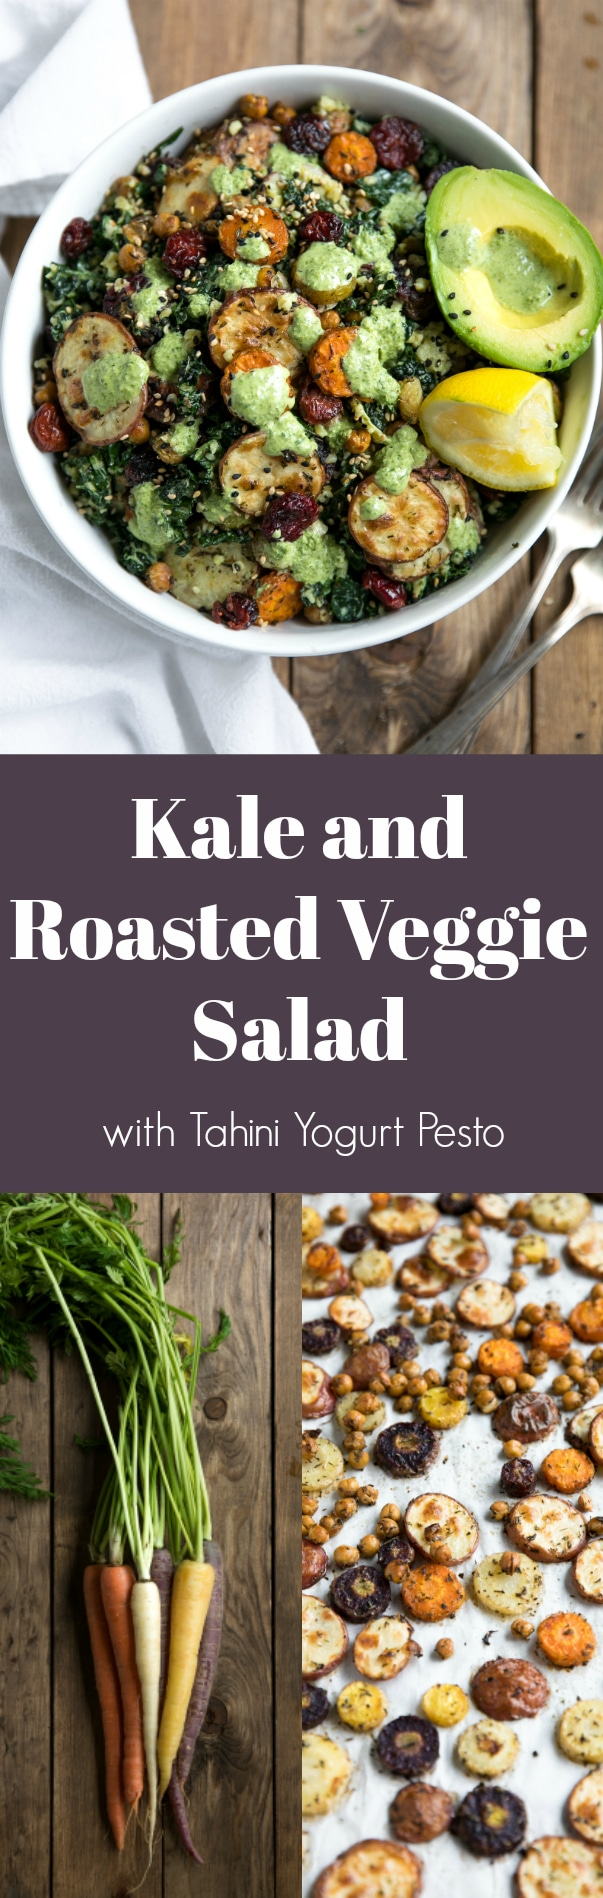 Kale and Roasted Veggie Salad with Tahini Yogurt Pesto combines healthy, energy-packed power foods like kale, chickpeas, and carrots into one delicious bowl via @theforkedspoon #salad #vegetarian #healthyrecipe #glutenfree #chickpeas #potatoes #pesto #basil #driedcranberries